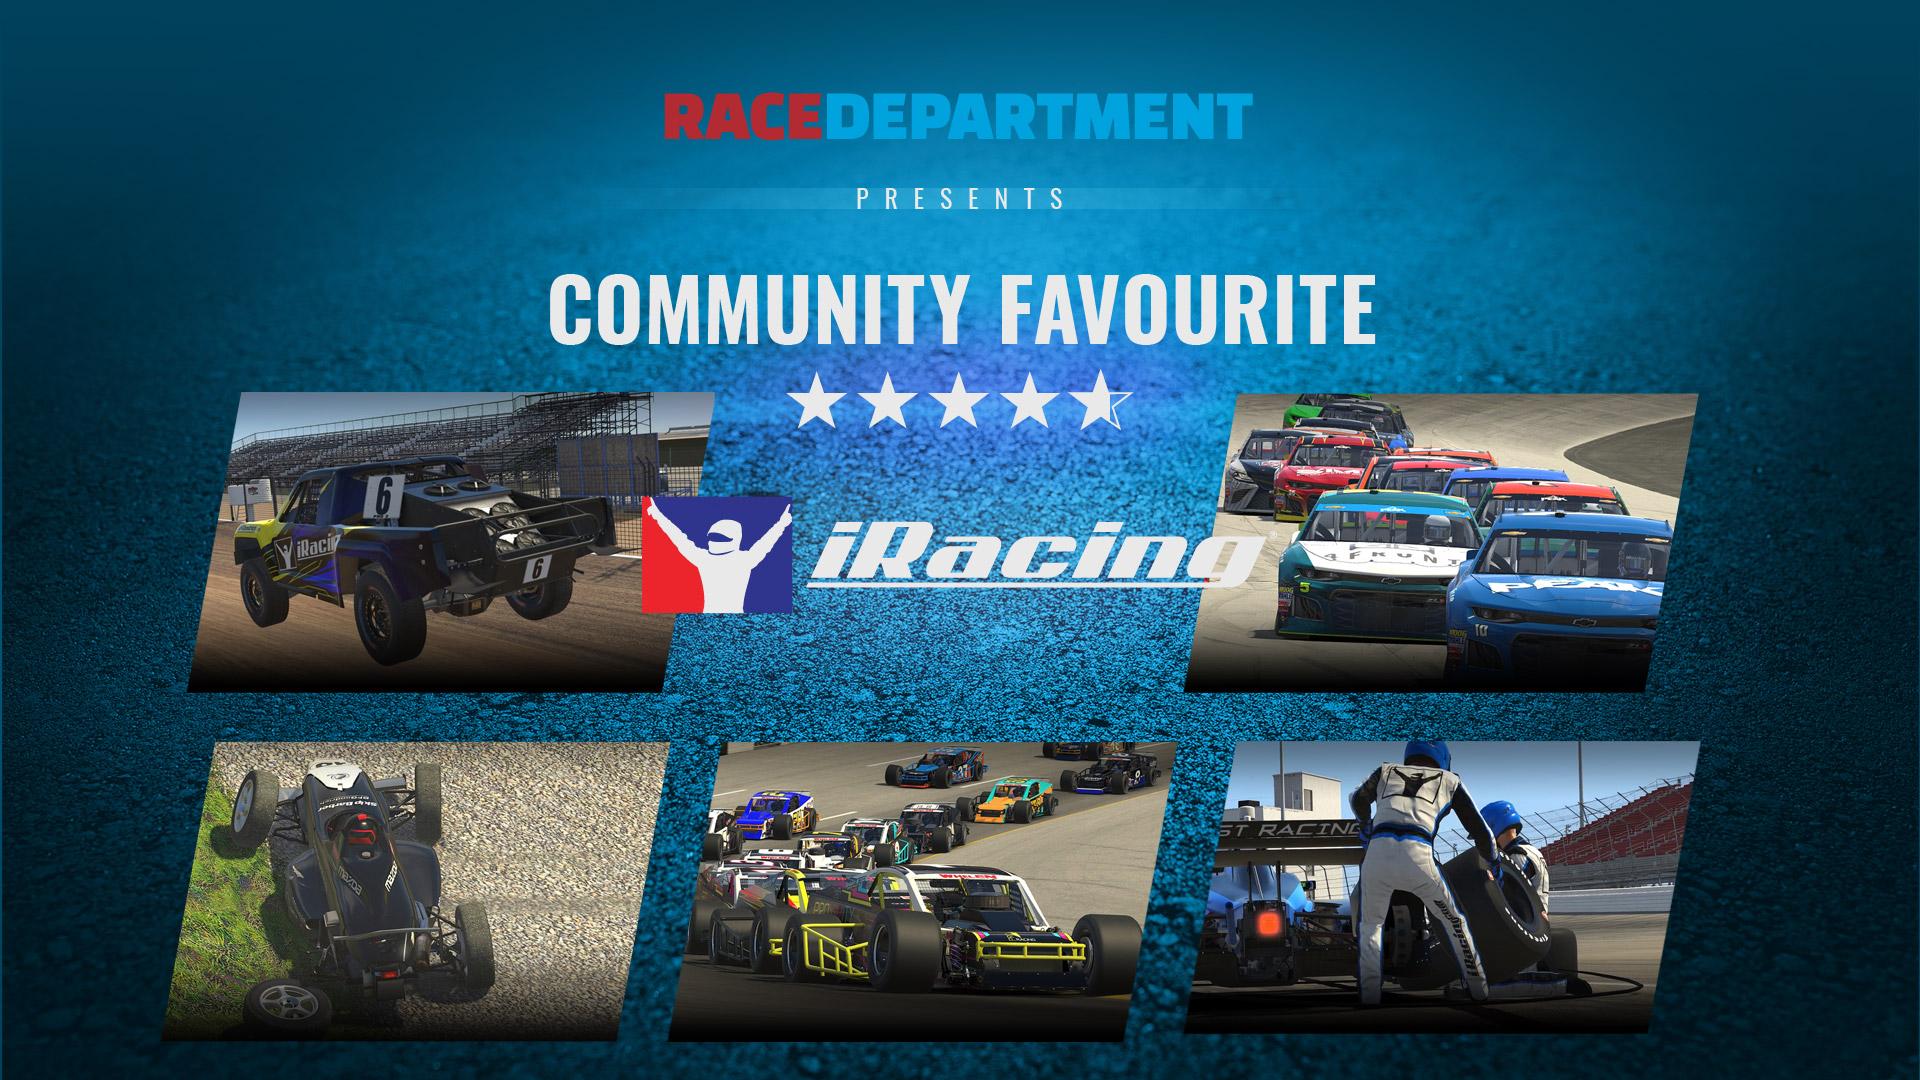 RD Community Favourite-iRv2.jpg